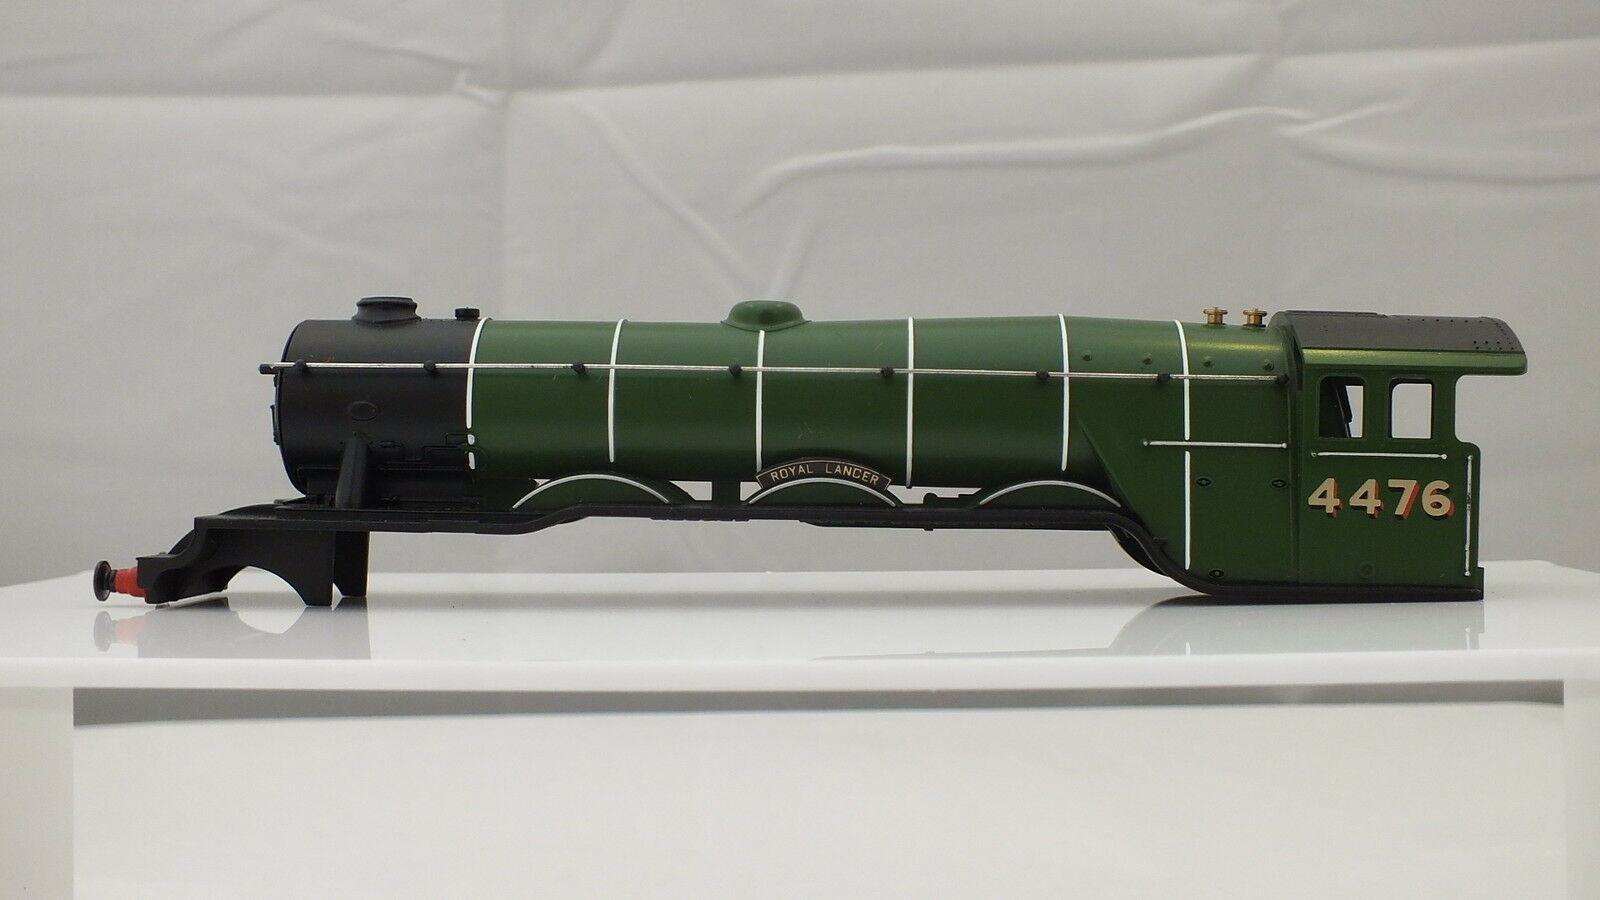 X3010 # HORNBY  A1 LNER BODY ROYAL LANCER R/NO 4476       S19A